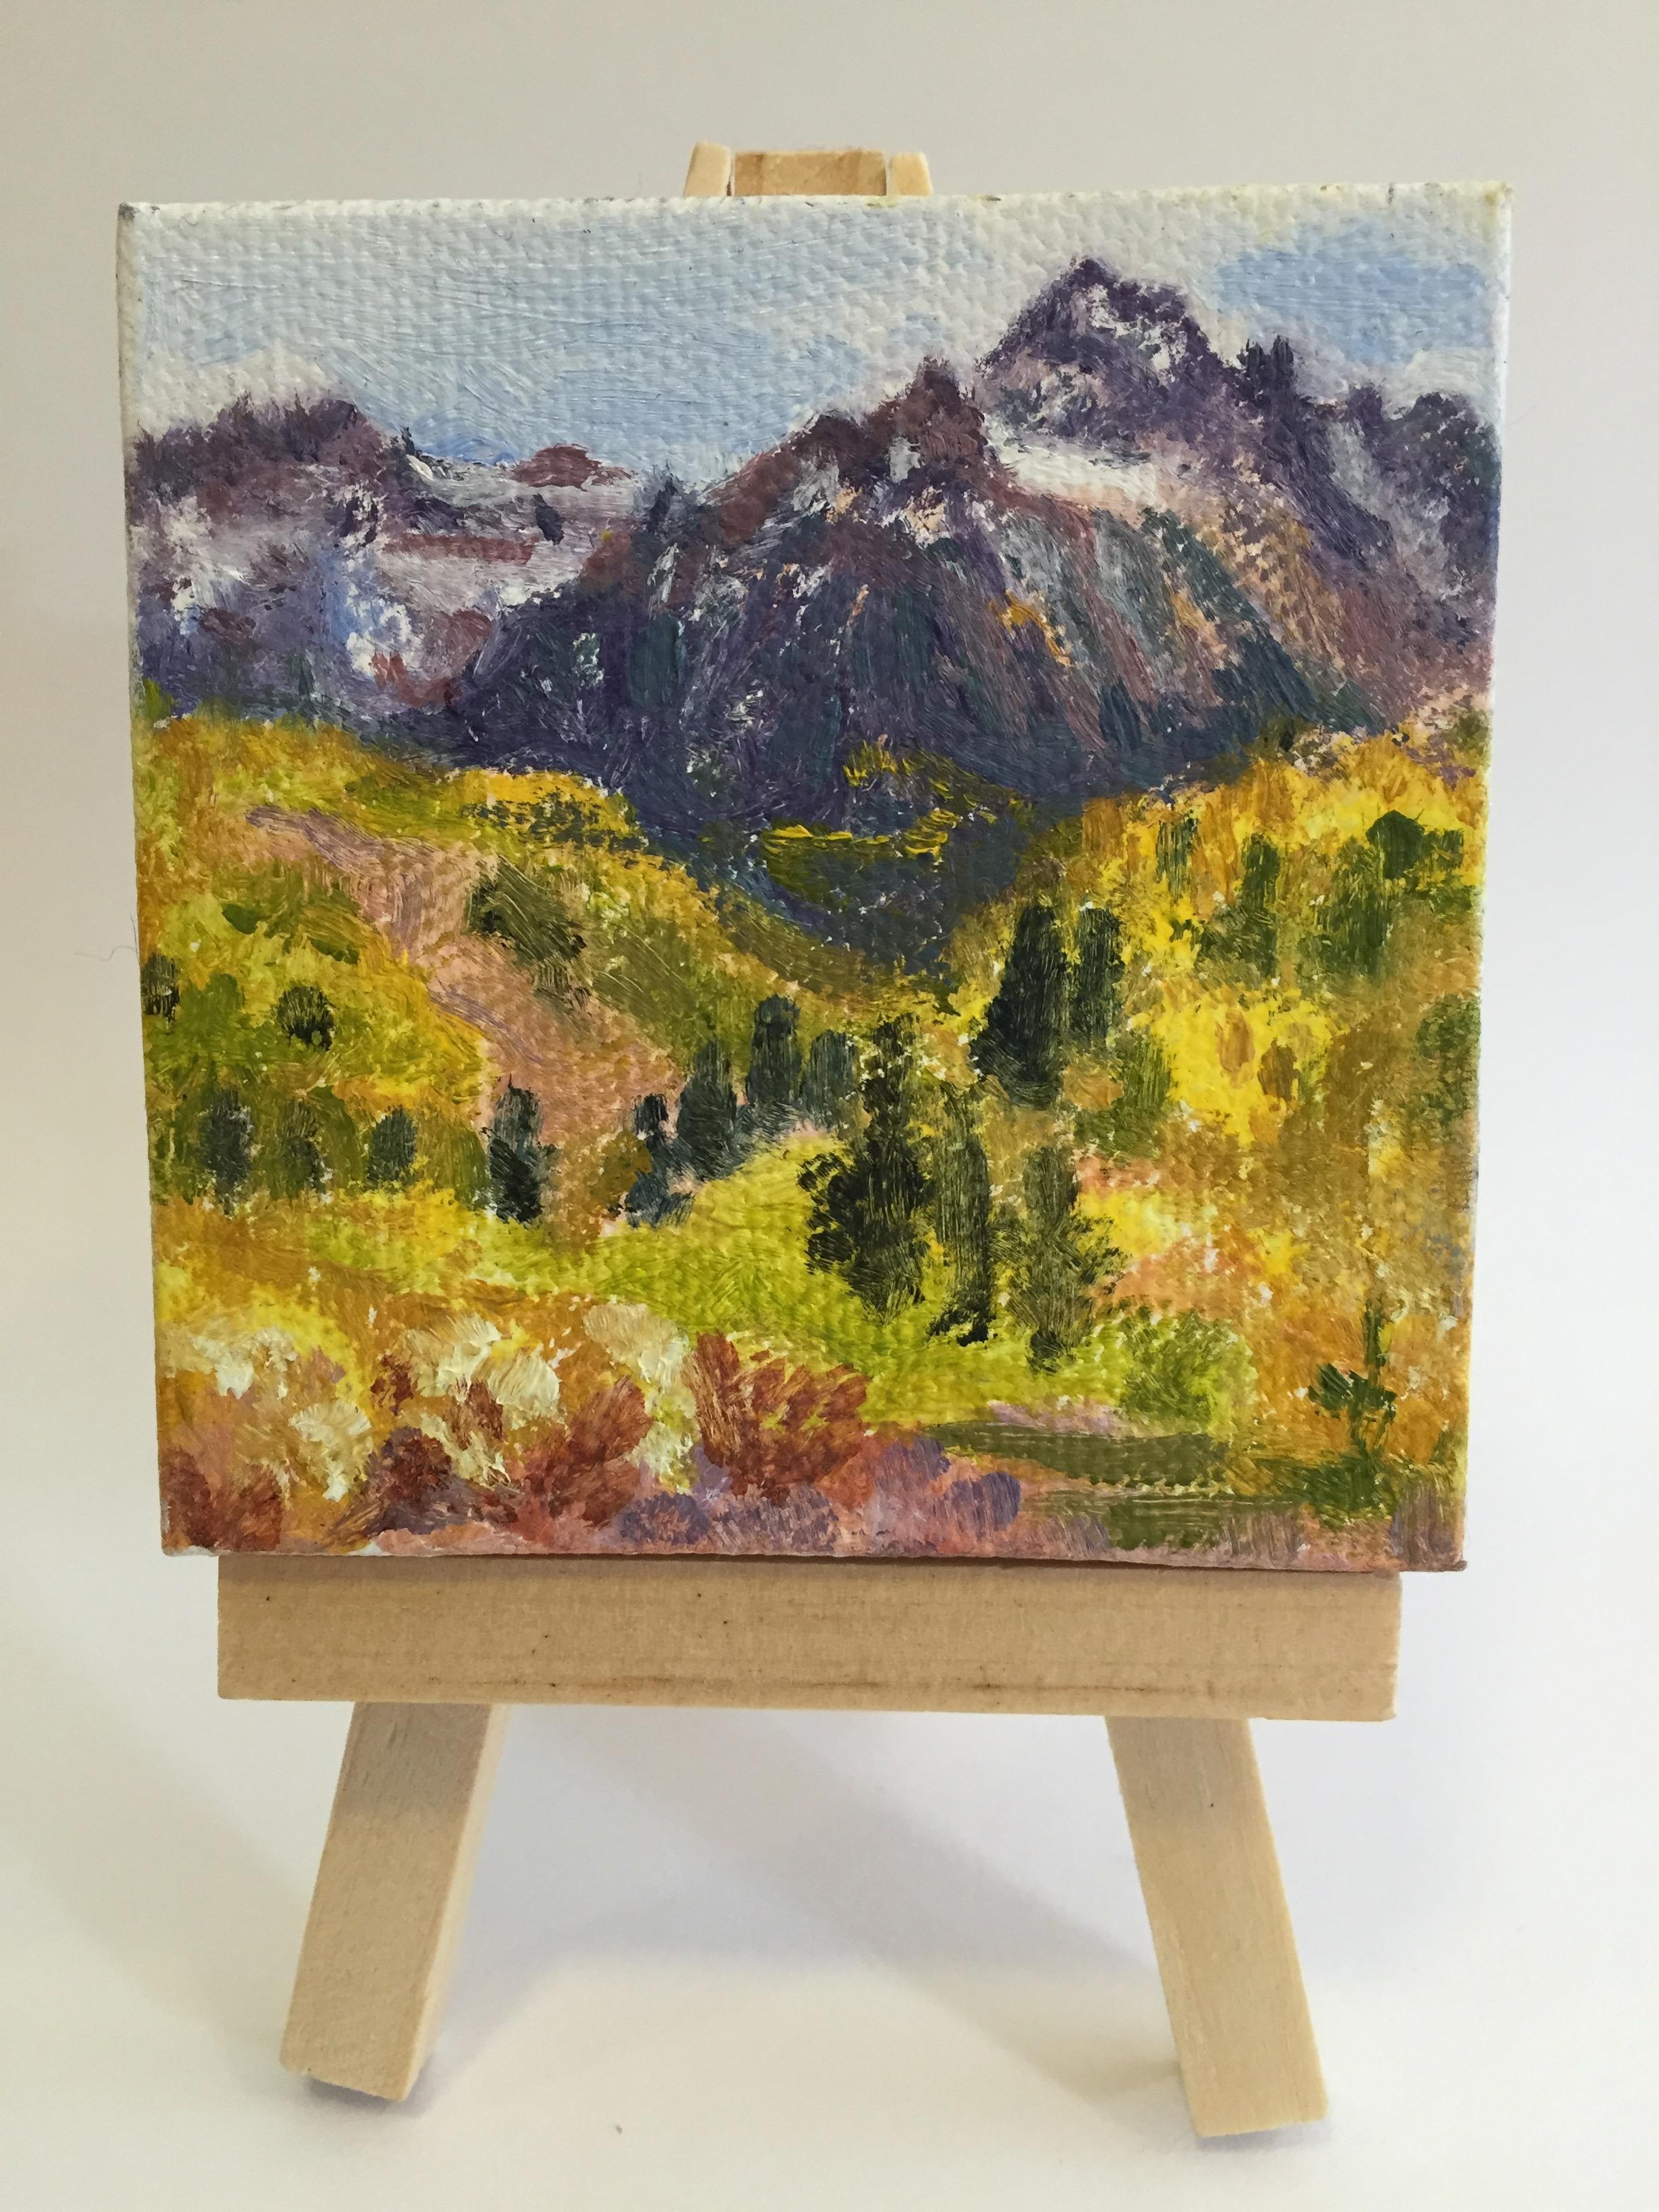 View of Mount Sneffels